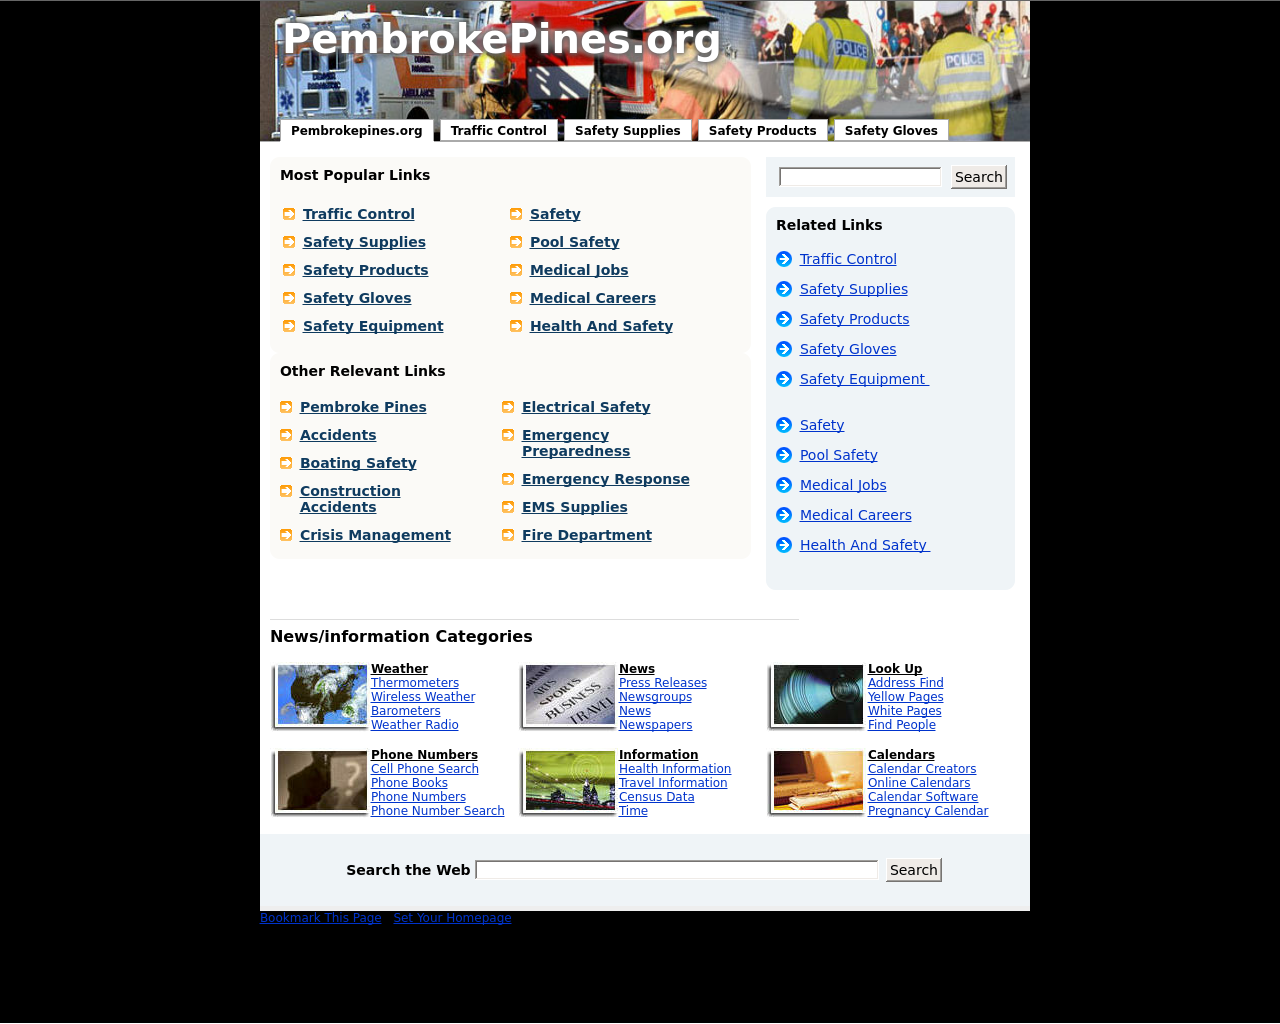 PembrokePines.org-Advertising-Reviews-Pricing